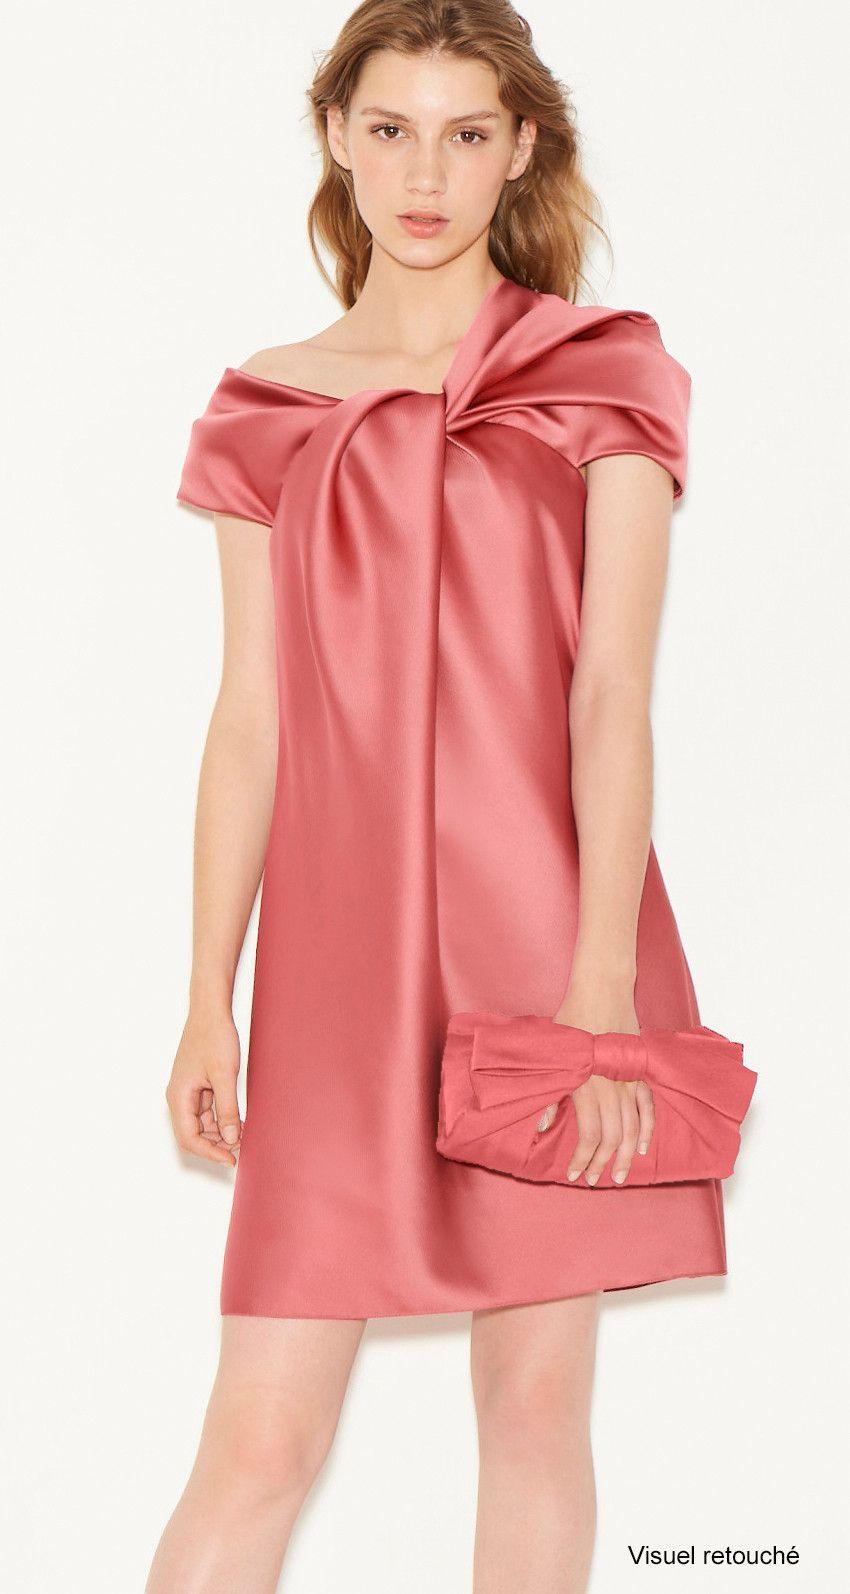 Robe trapeze en satin duchesse   Satin, Paule ka and Dressing gown